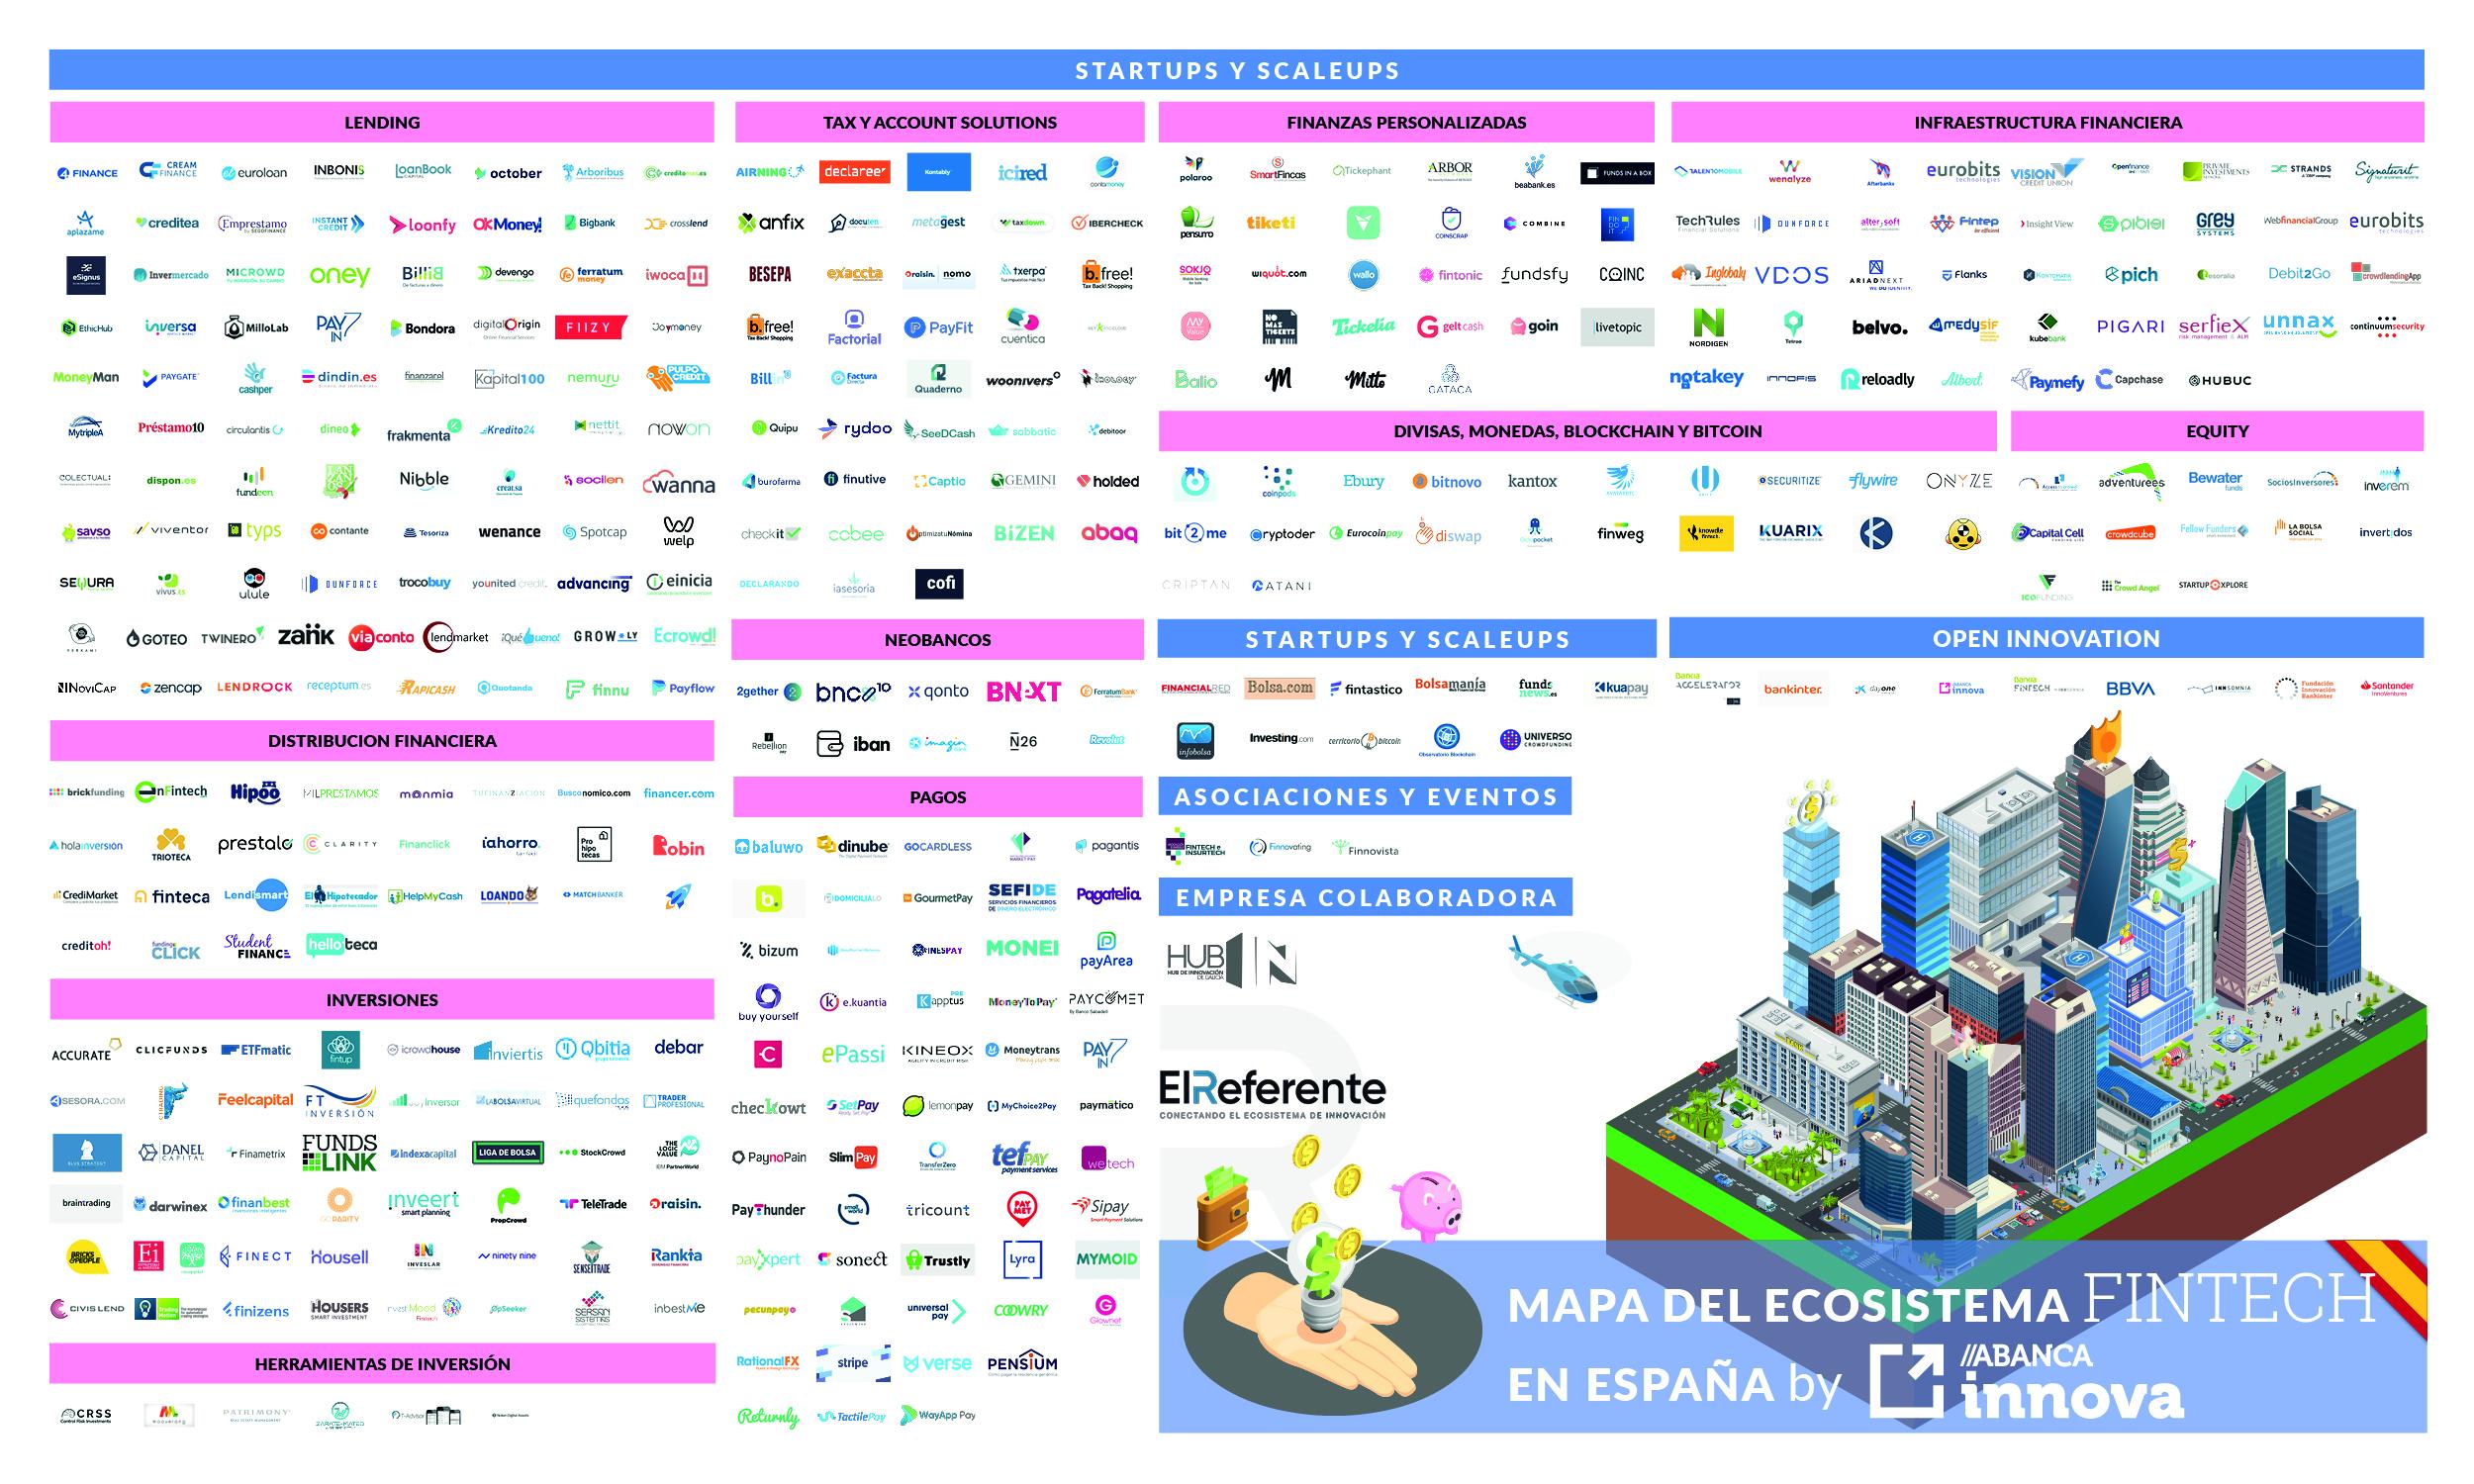 Mapa_Fintech_espana2020